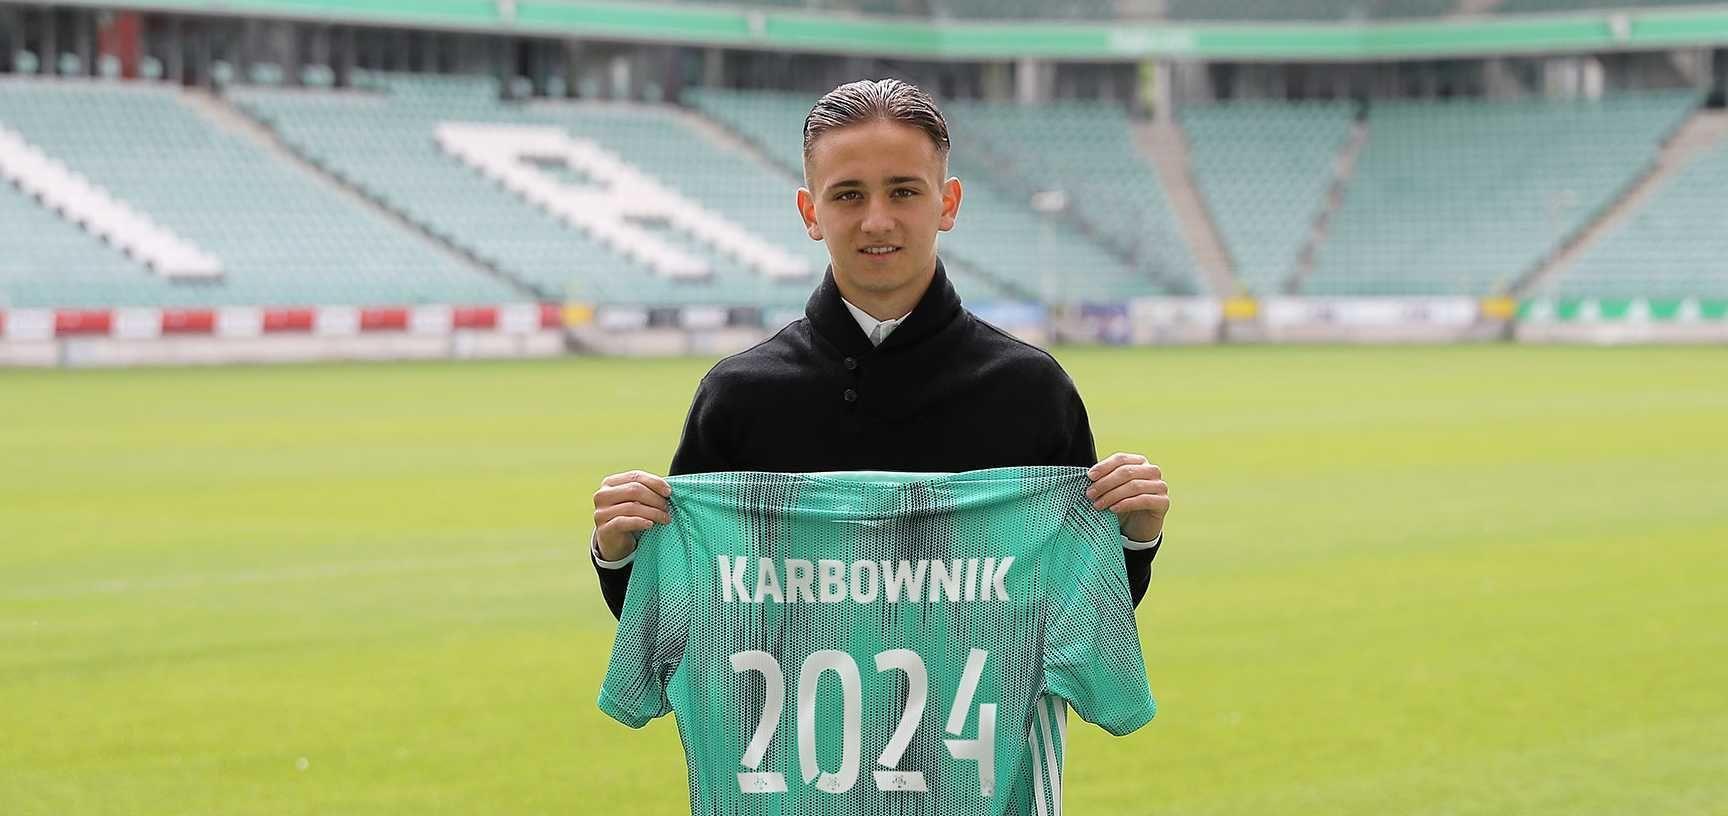 Michał Karbownik 2024!